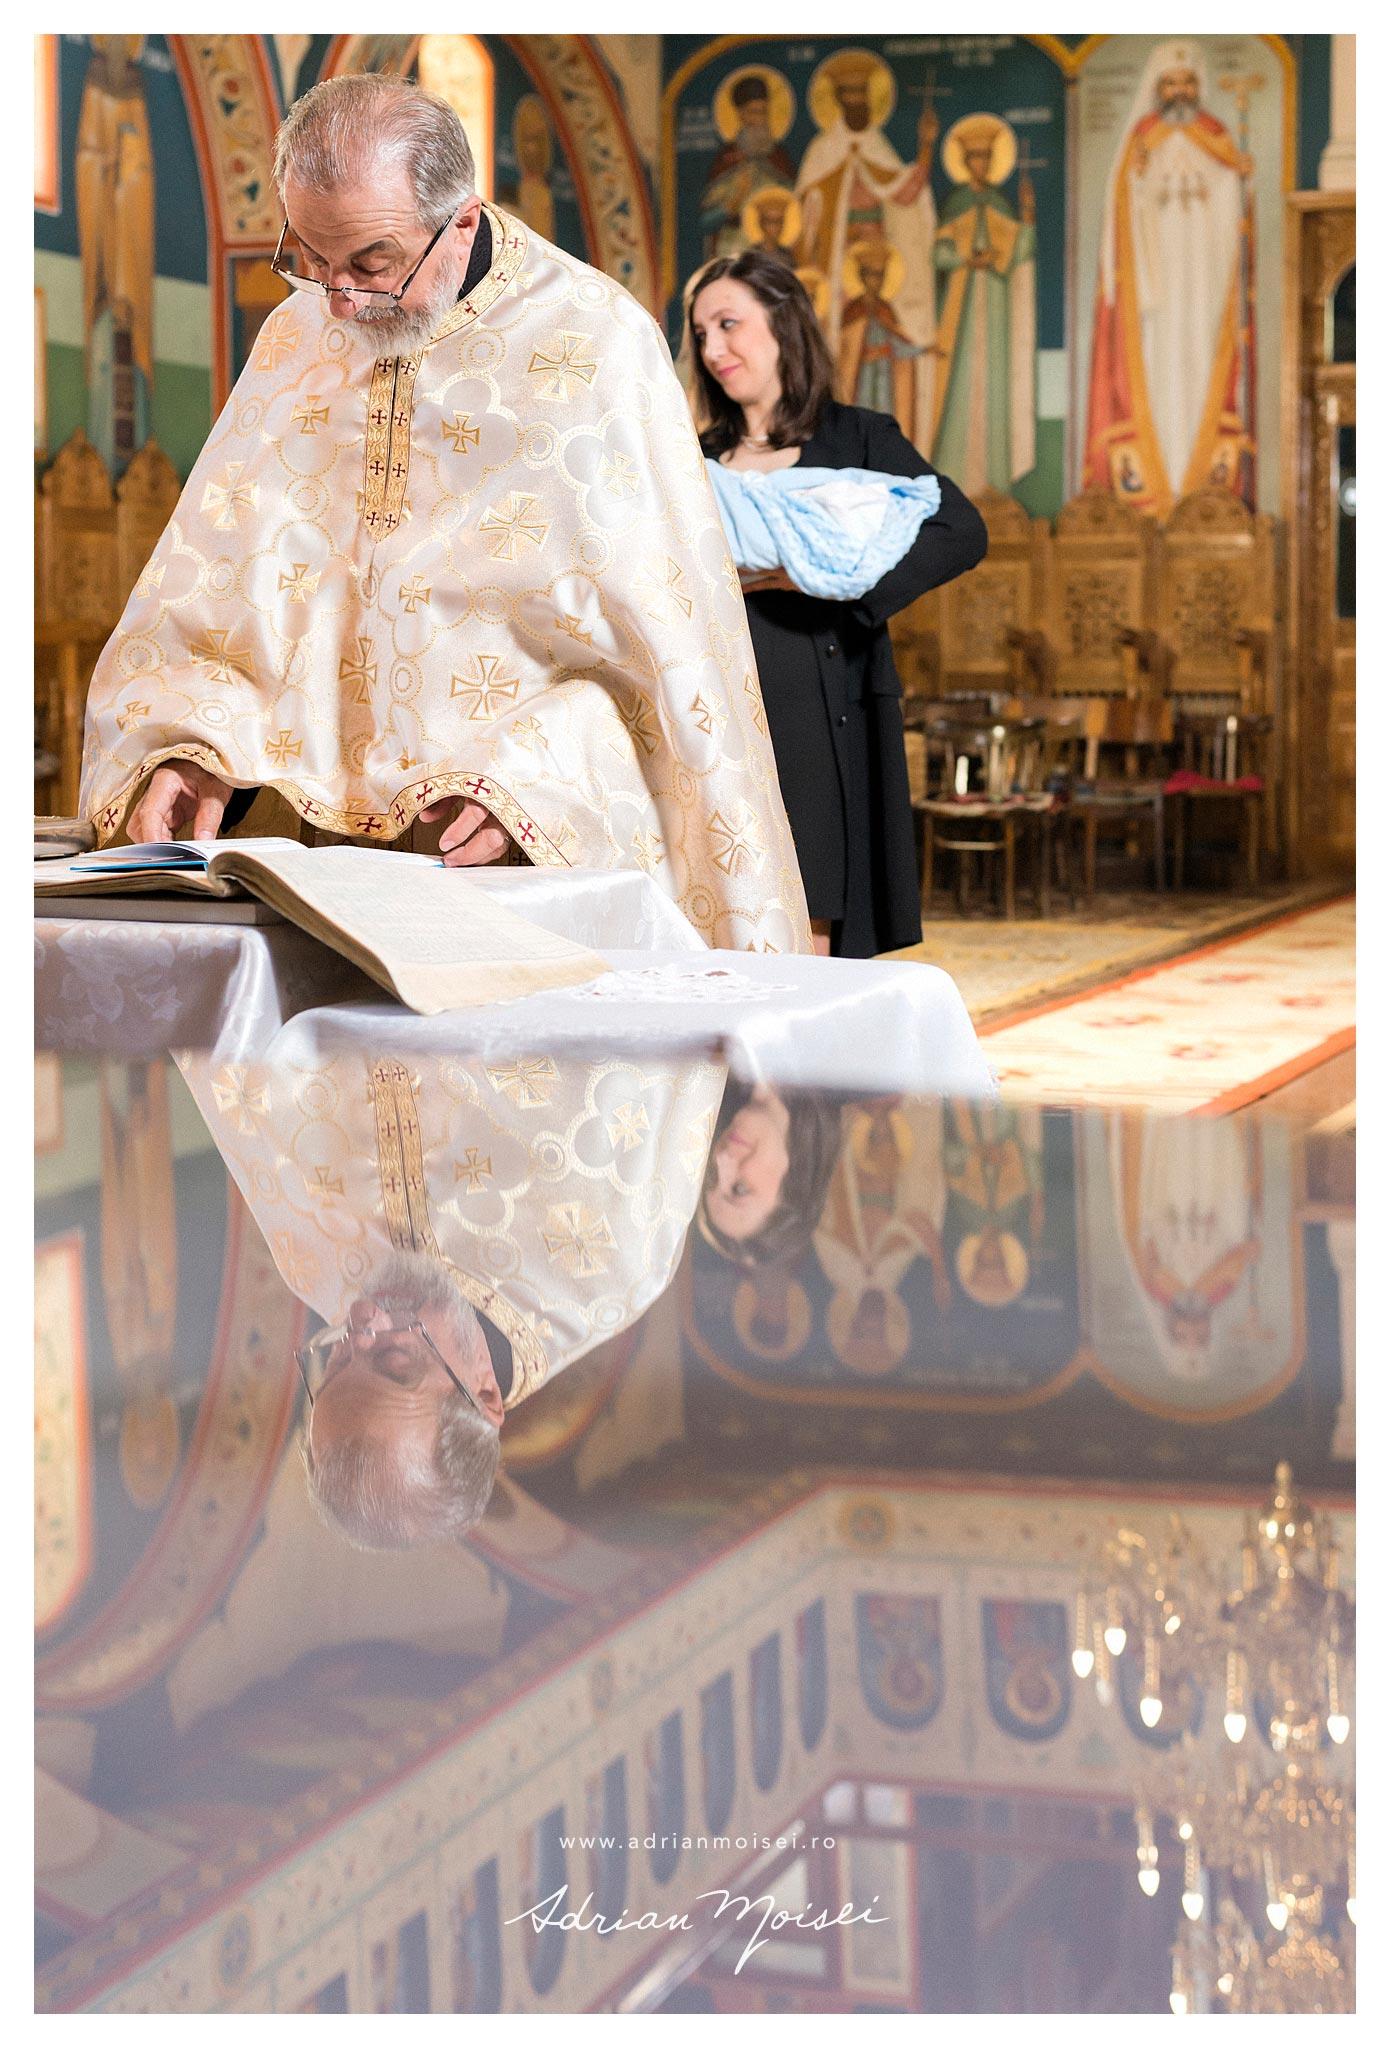 Taina sfântului botez la Iasi de Adrian Moisei